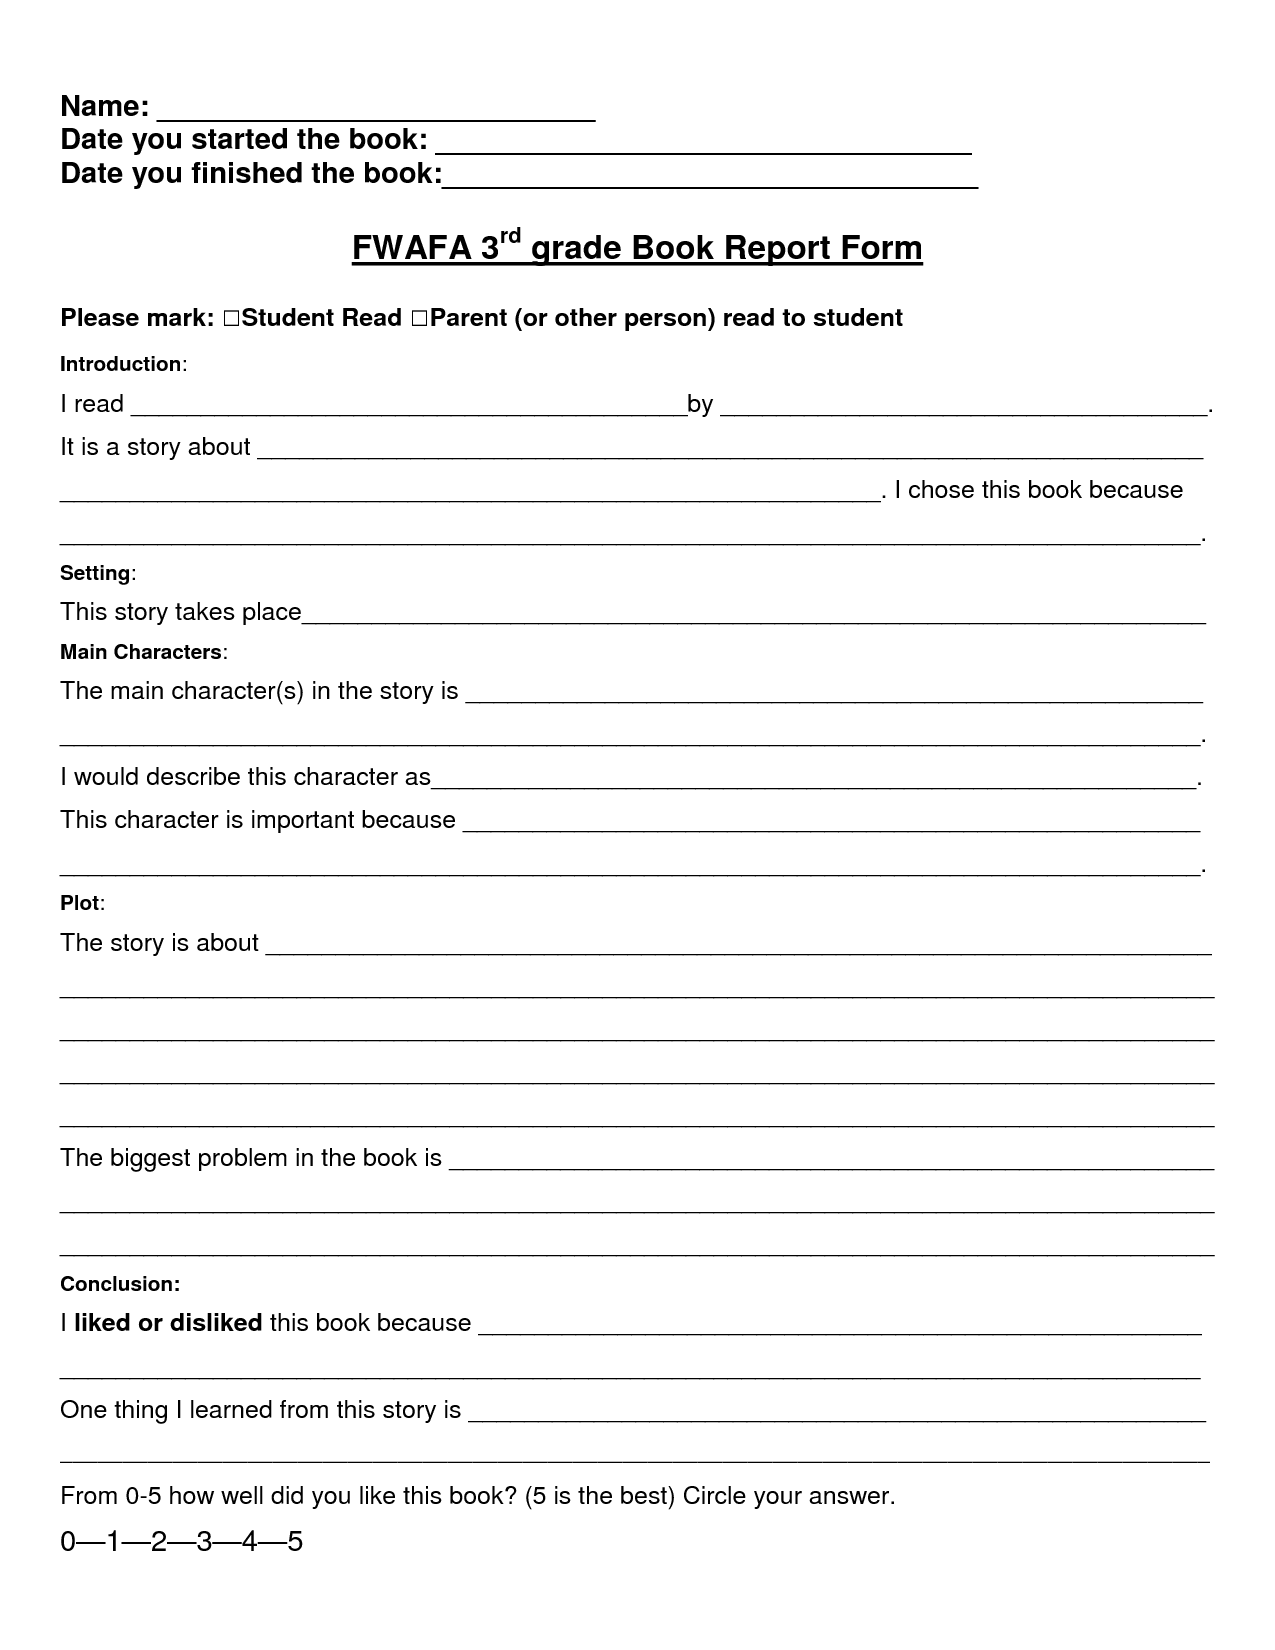 Free Third Grade Book Report Template